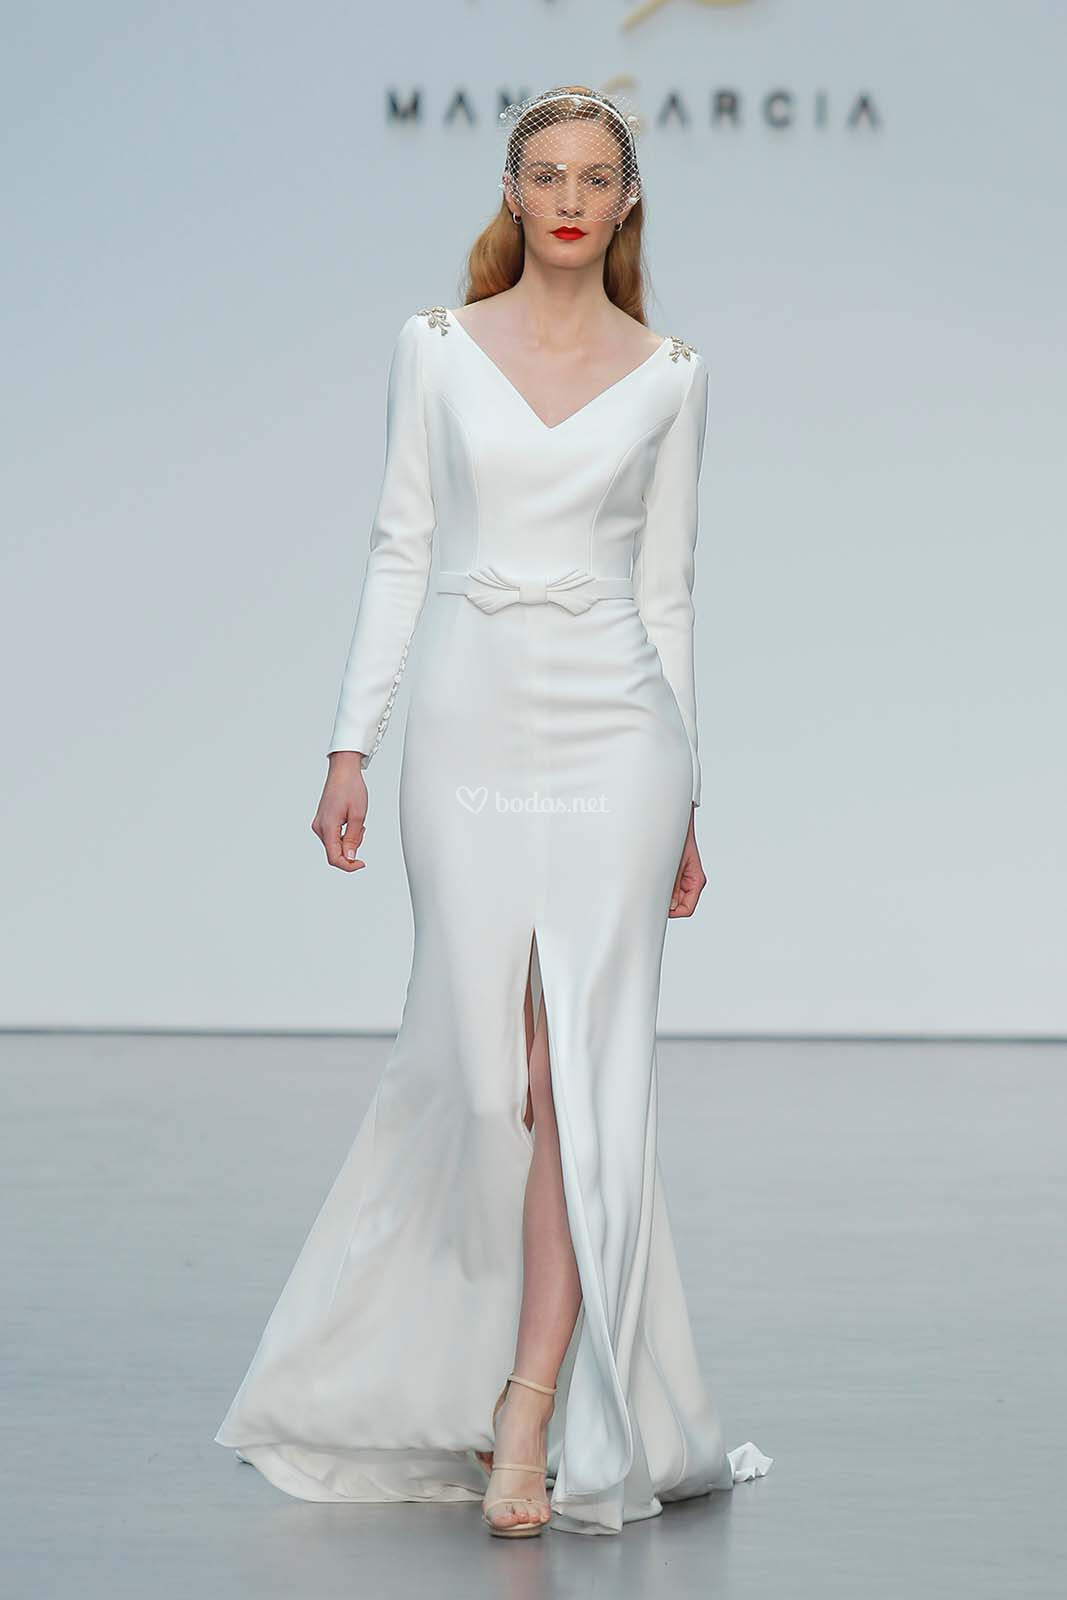 Outstanding Vestidos Novia Salamanca Image - Colorful Wedding Dress ...